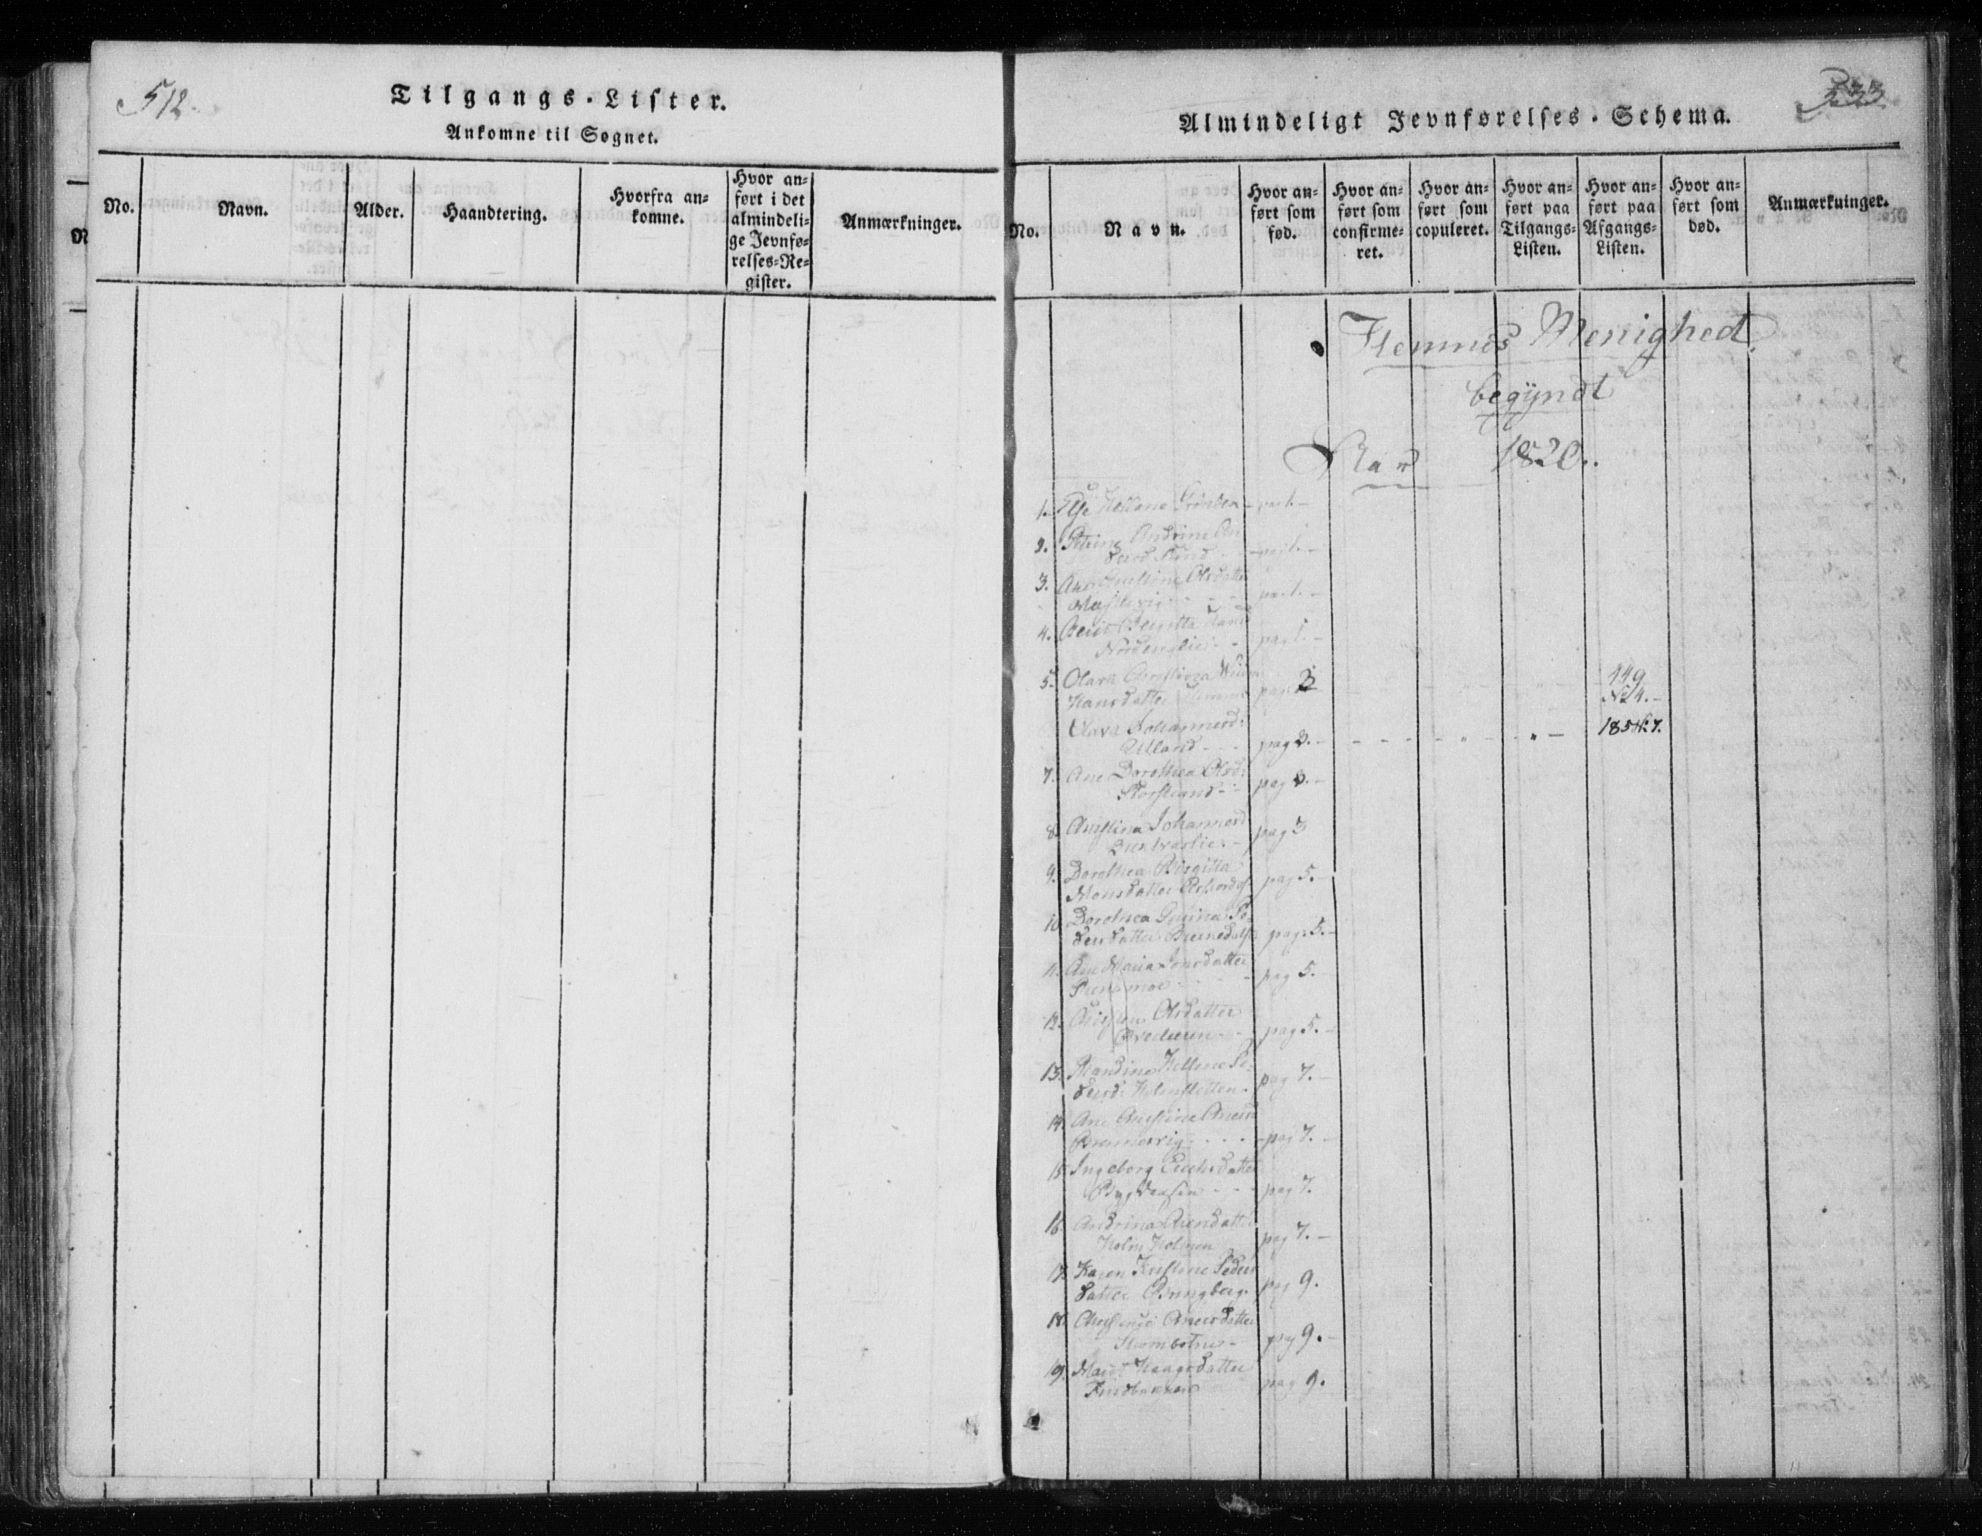 SAT, Ministerialprotokoller, klokkerbøker og fødselsregistre - Nordland, 825/L0353: Ministerialbok nr. 825A07, 1820-1826, s. 532-533